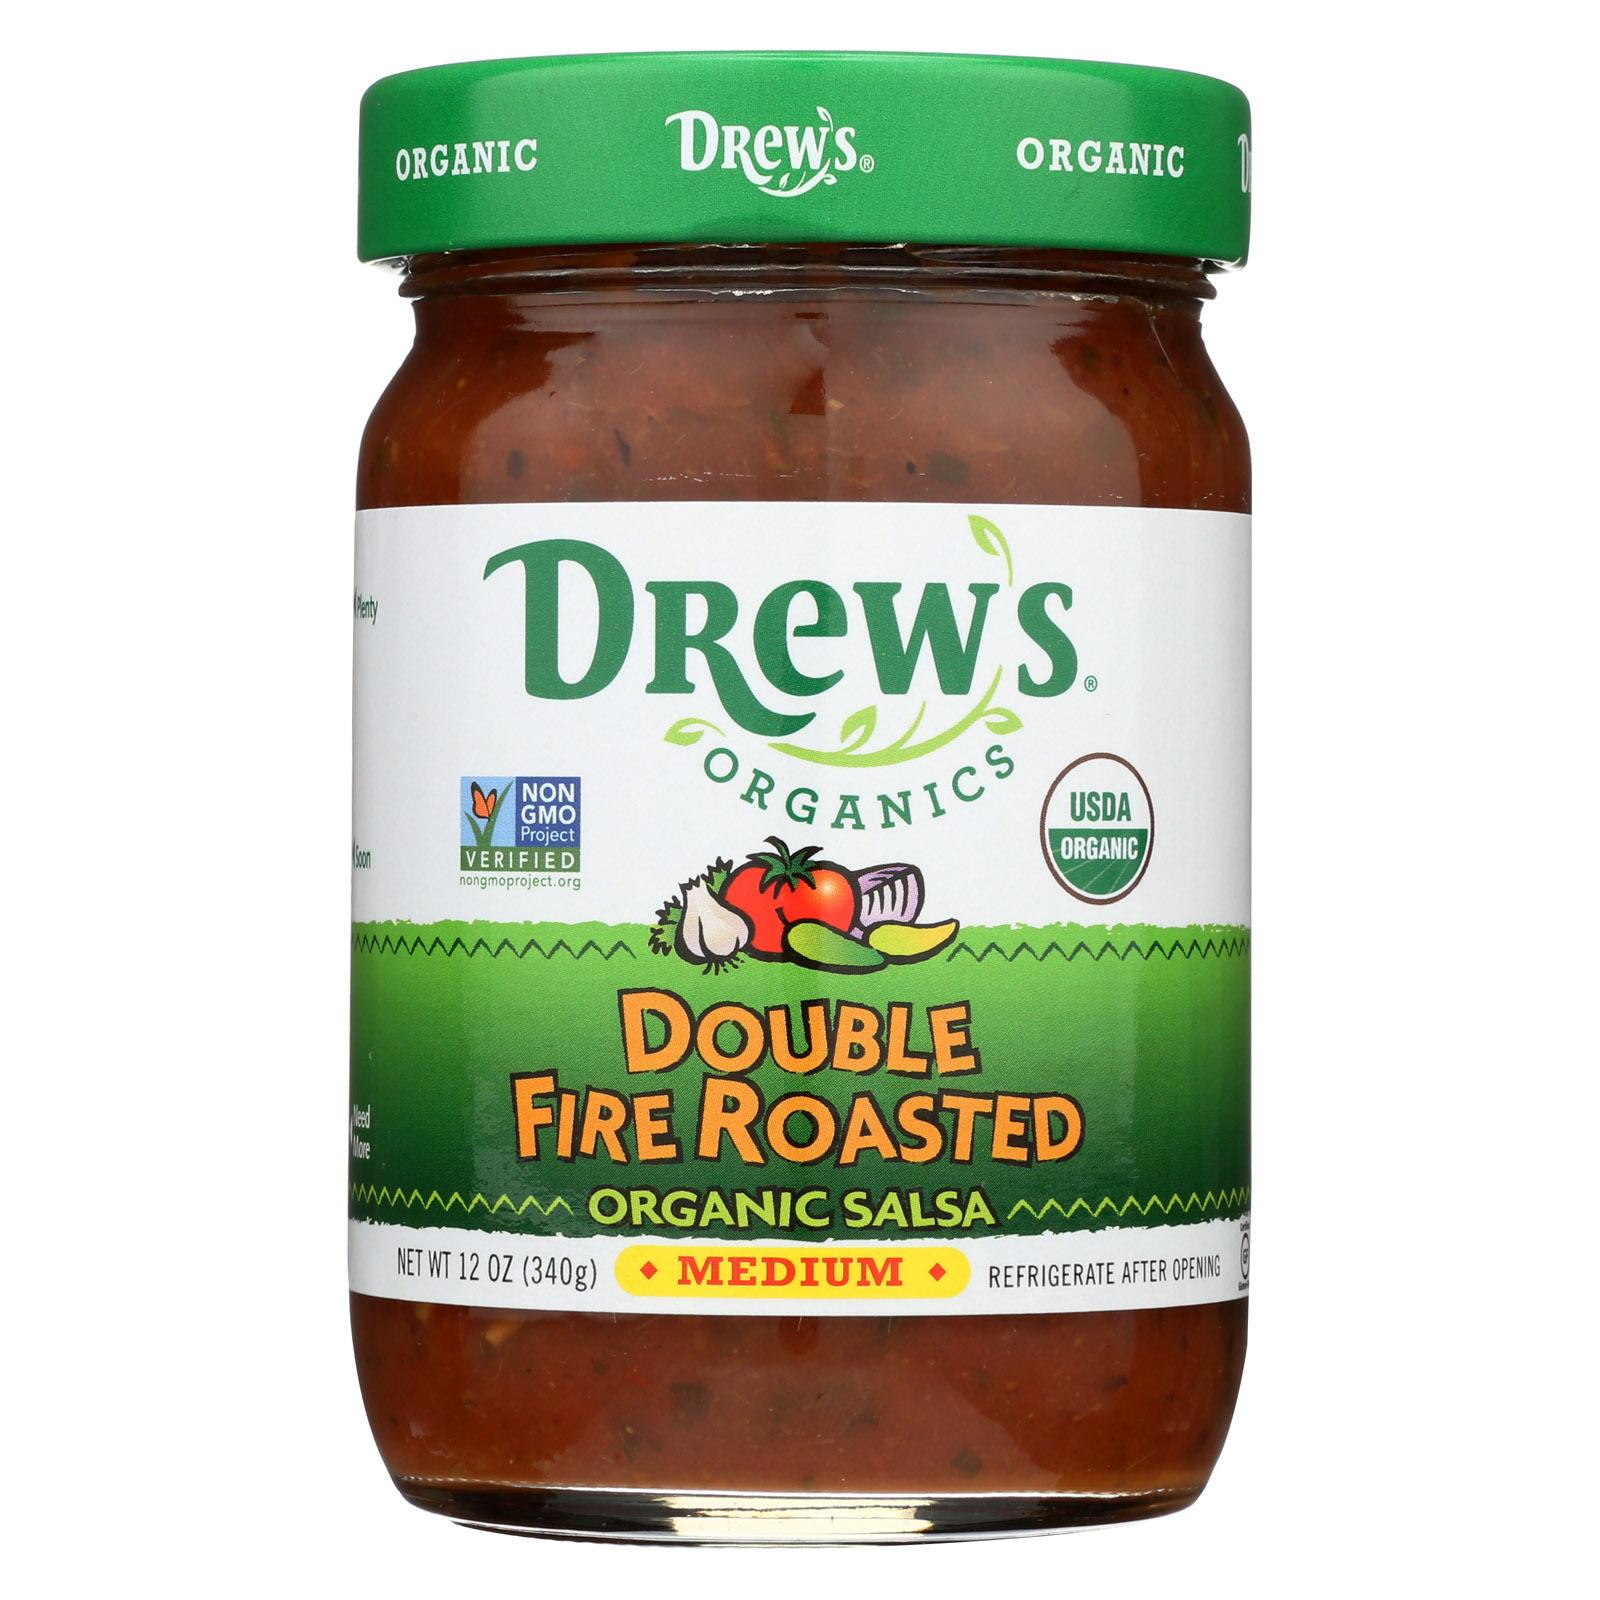 Drew's Organics Double Fire Roasted Salsa - 12 Oz. - Case of 6